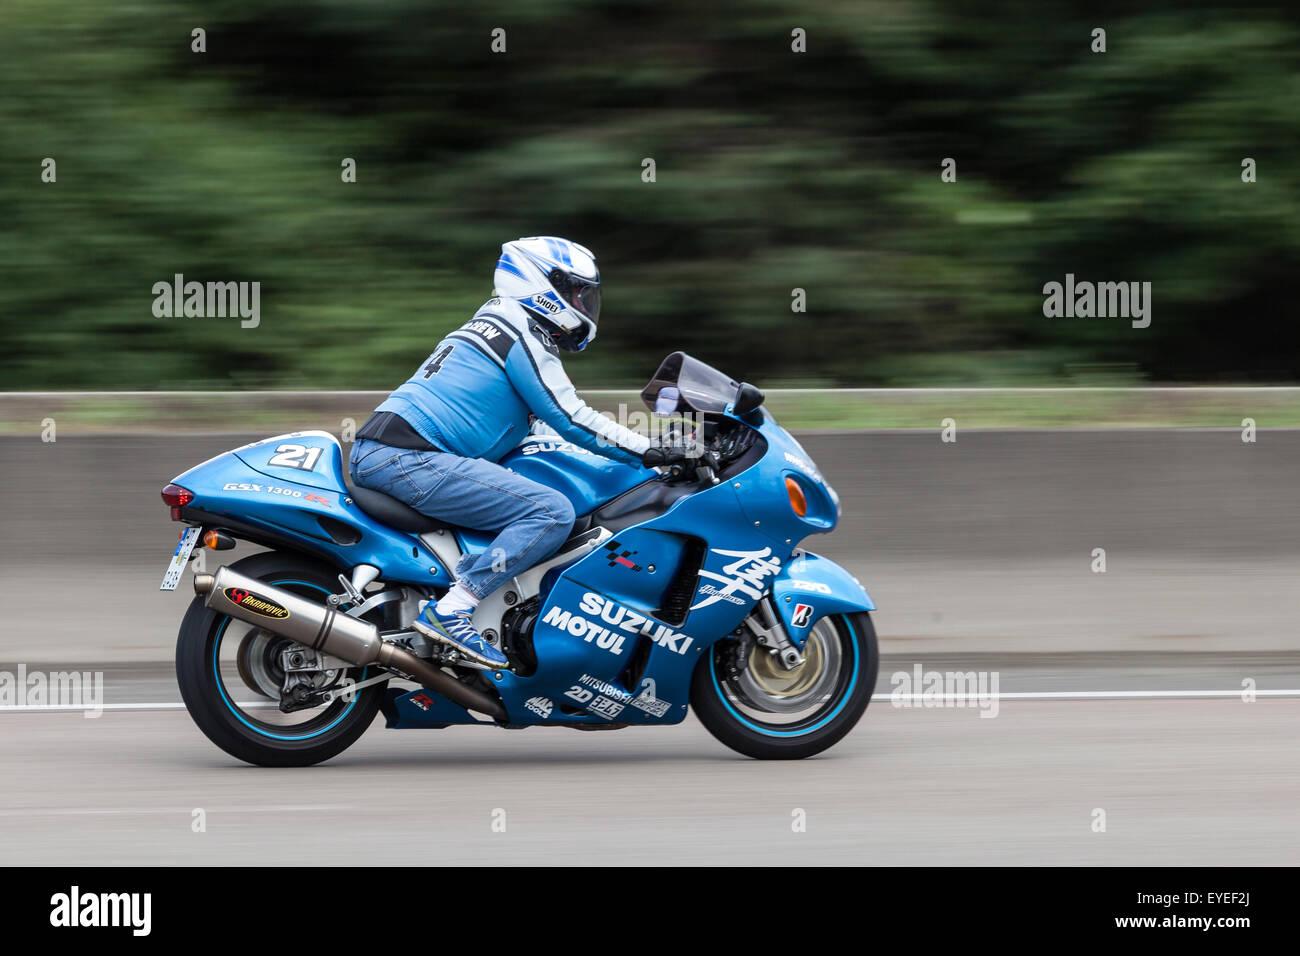 Suzuki Hayabusa GSX 1300 R Motorcycle Moving Fast On The Highway A5 Near  Frankfurt. July